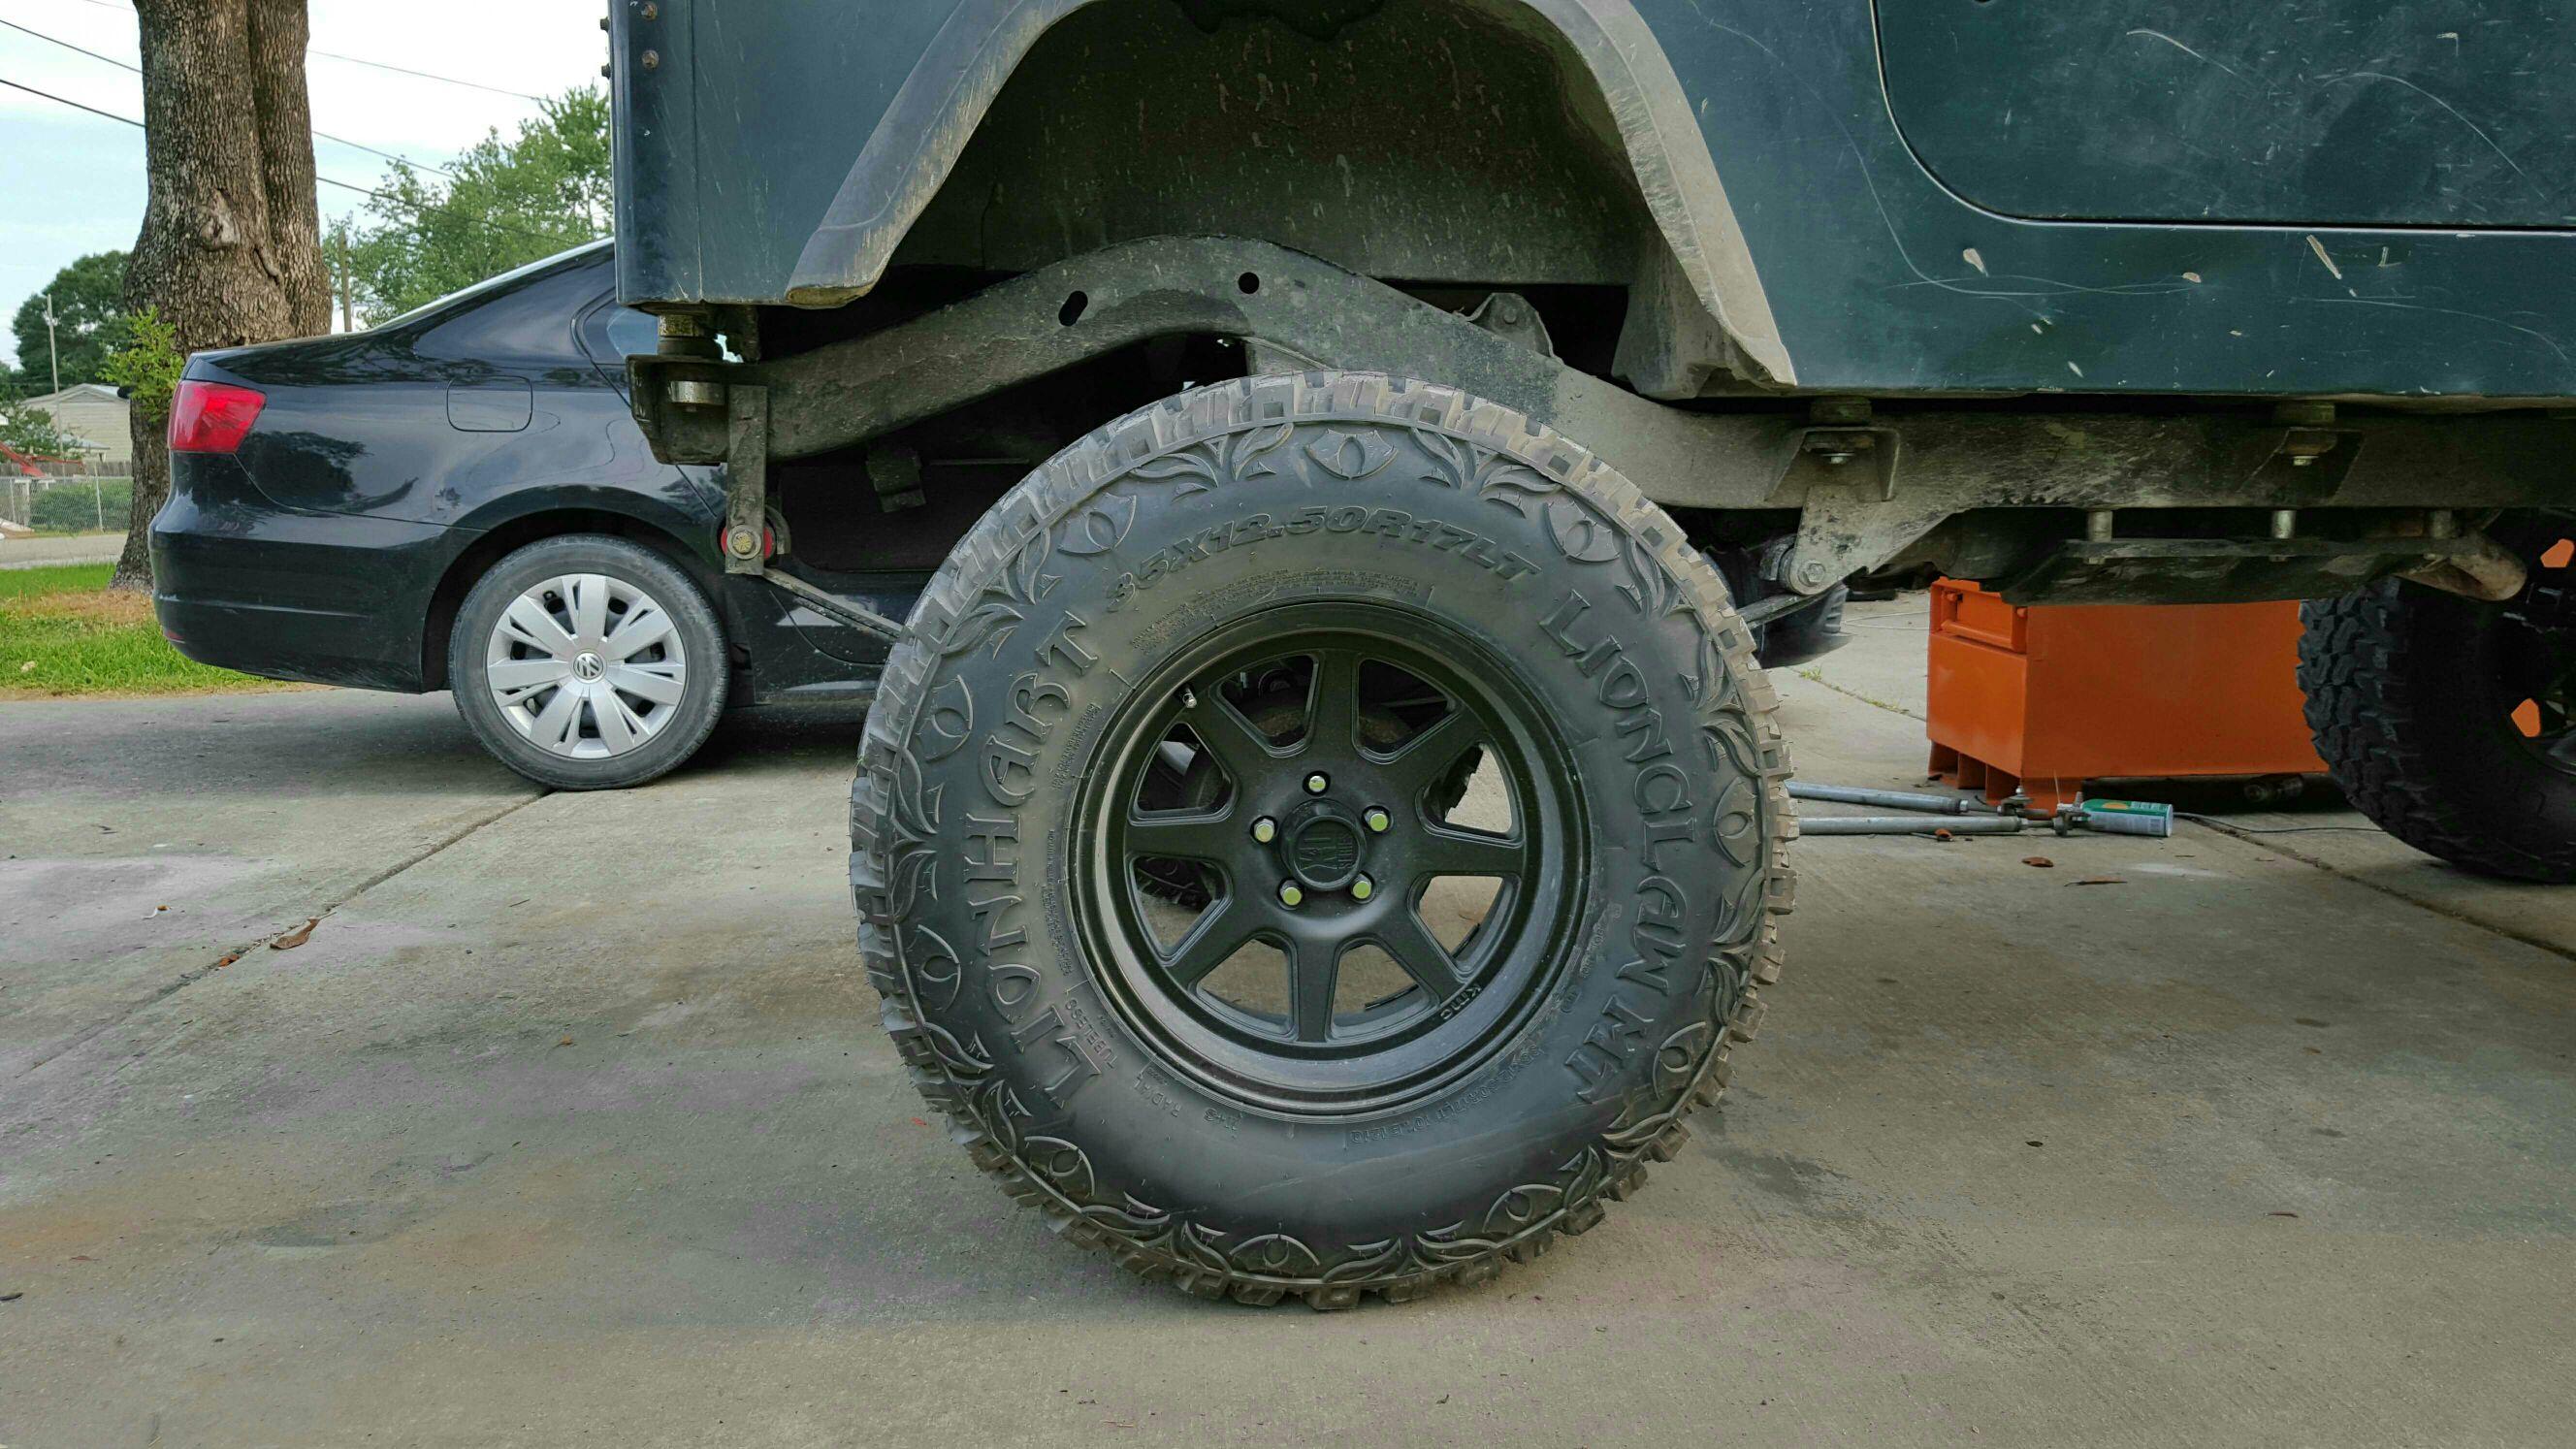 Xd Rims For Sale >> Nice simple black rims - Jeep Wrangler Forum